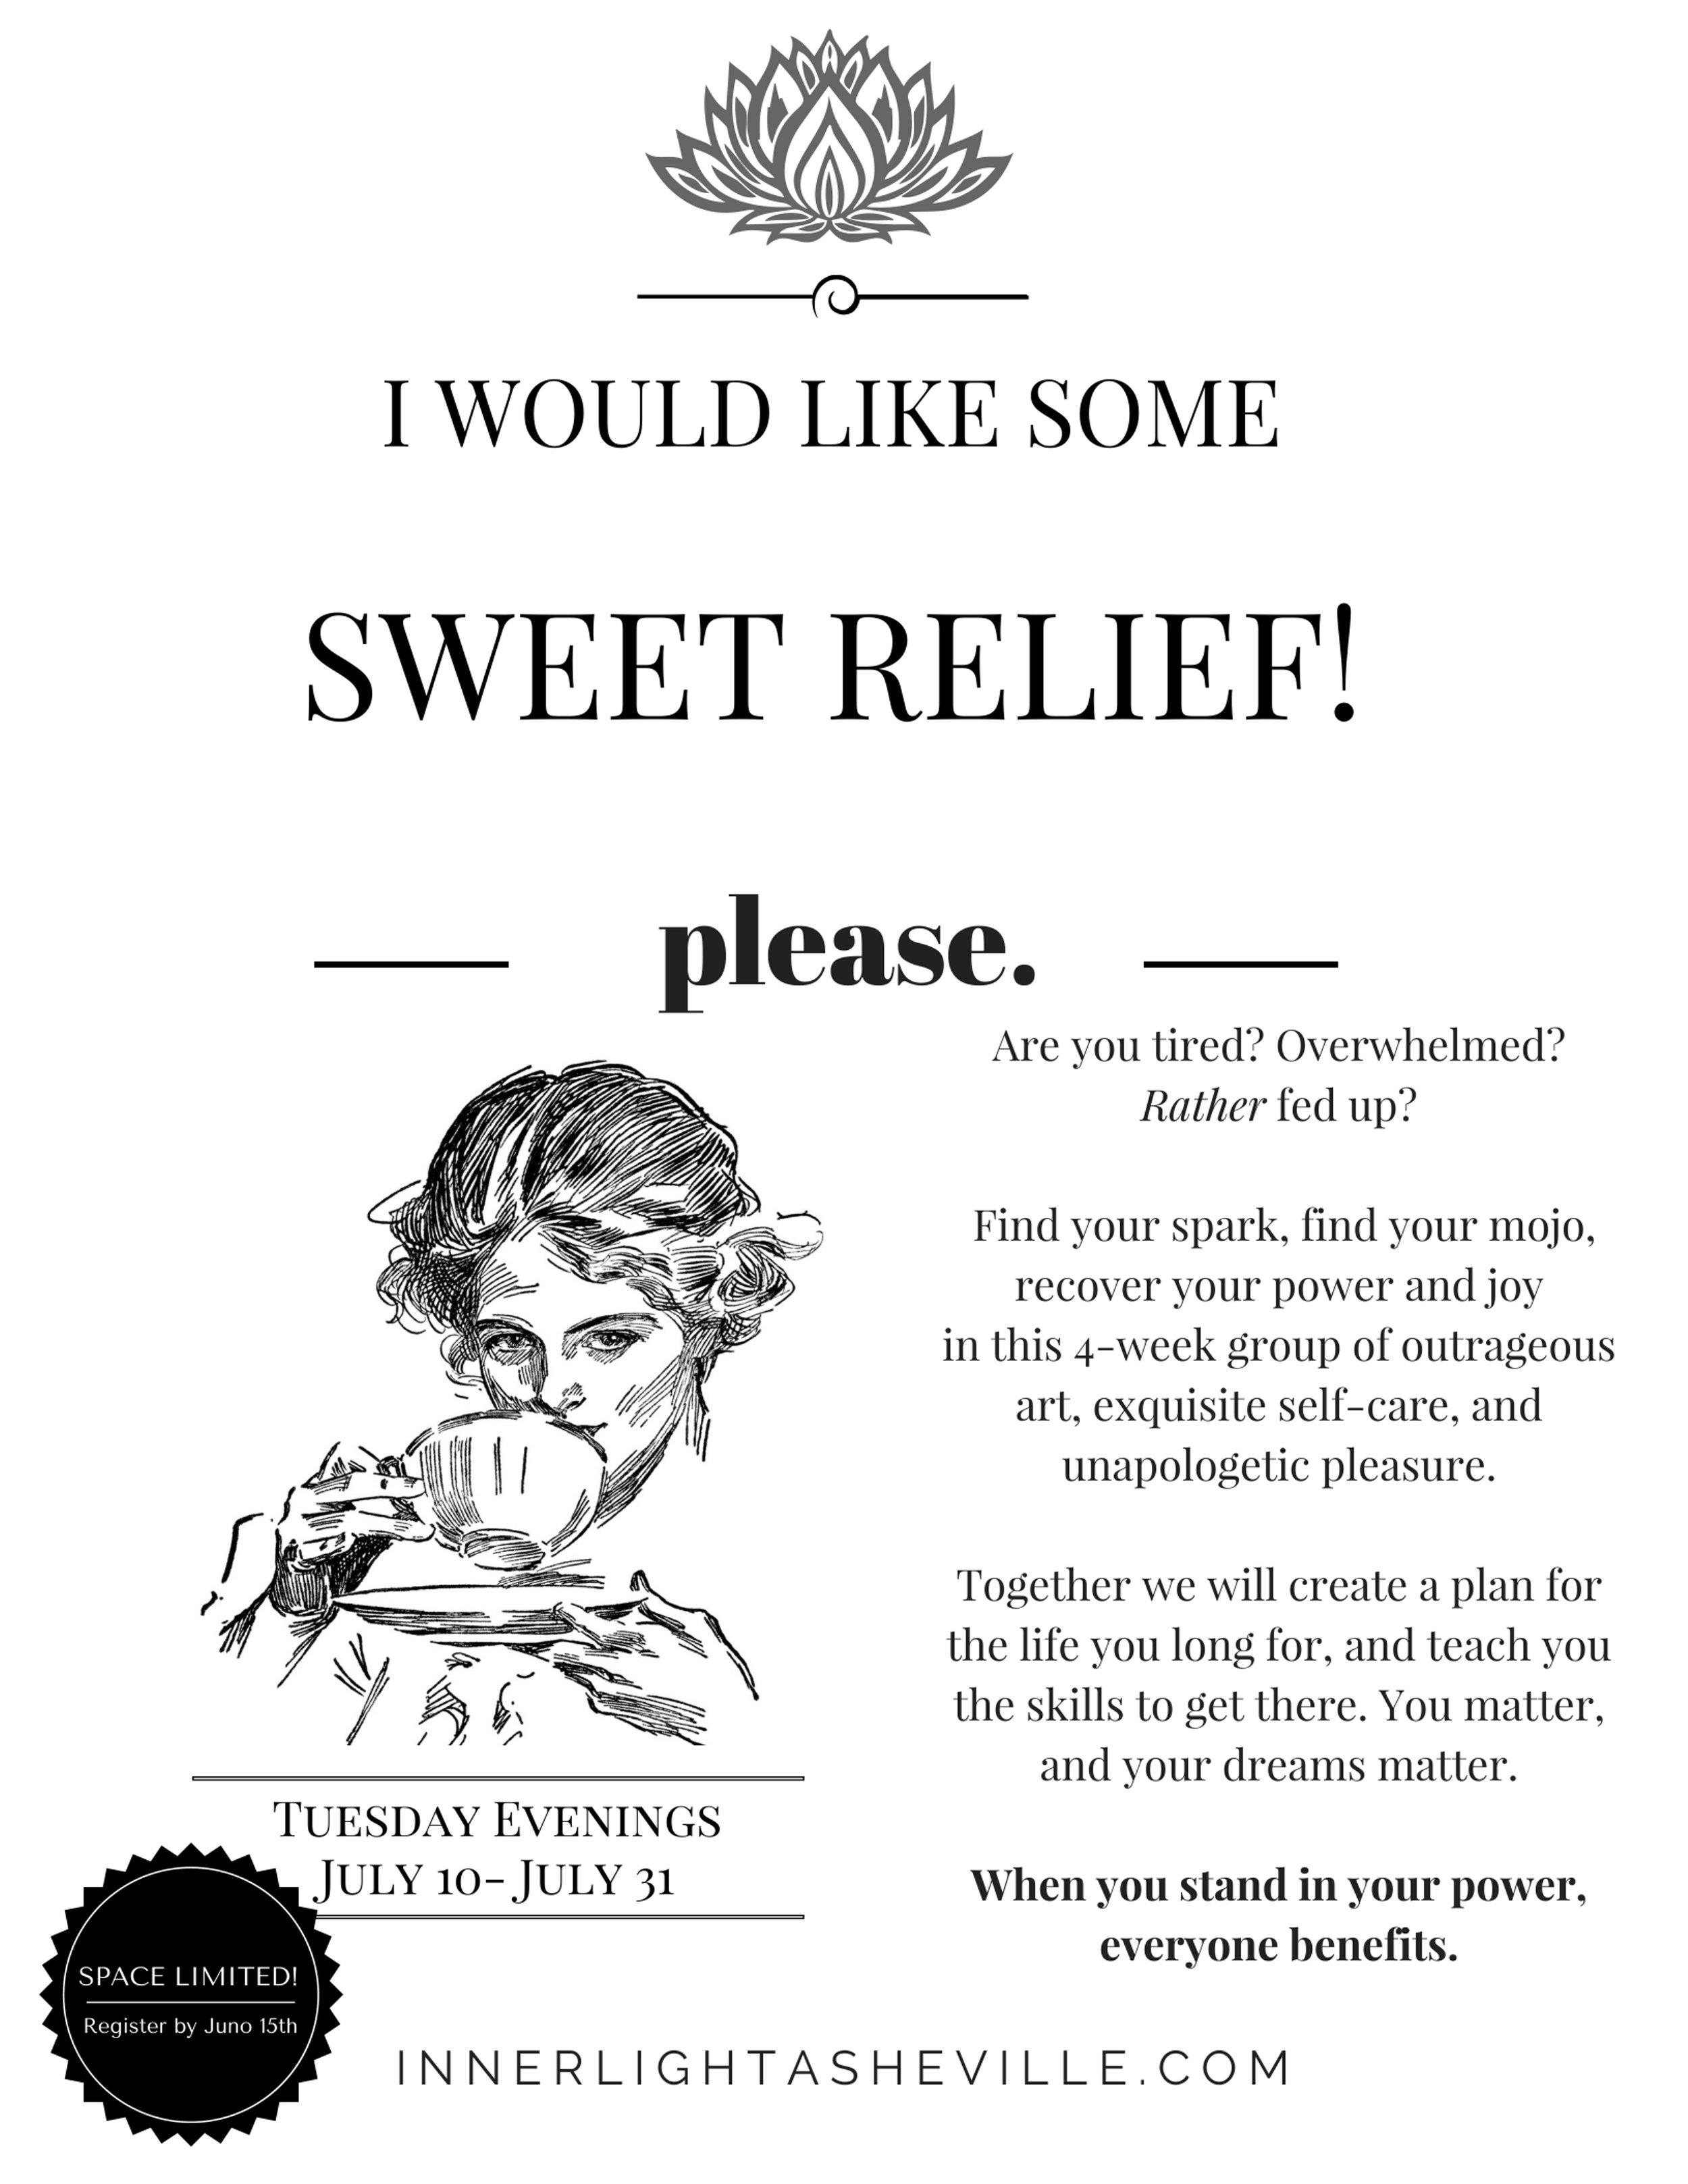 sweet relief2.jpg